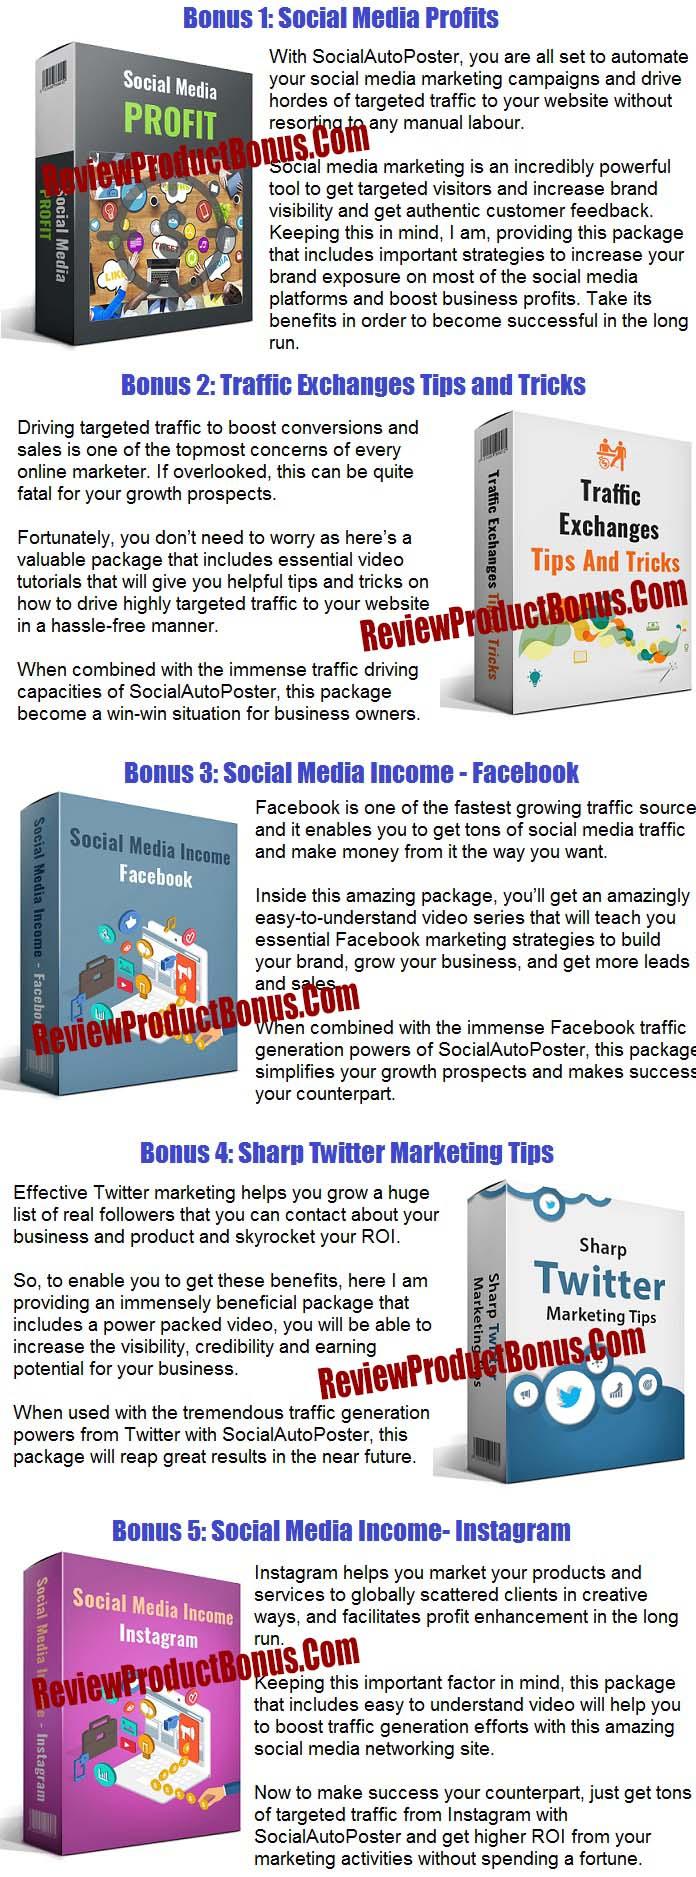 Social Auto Poster Bonus